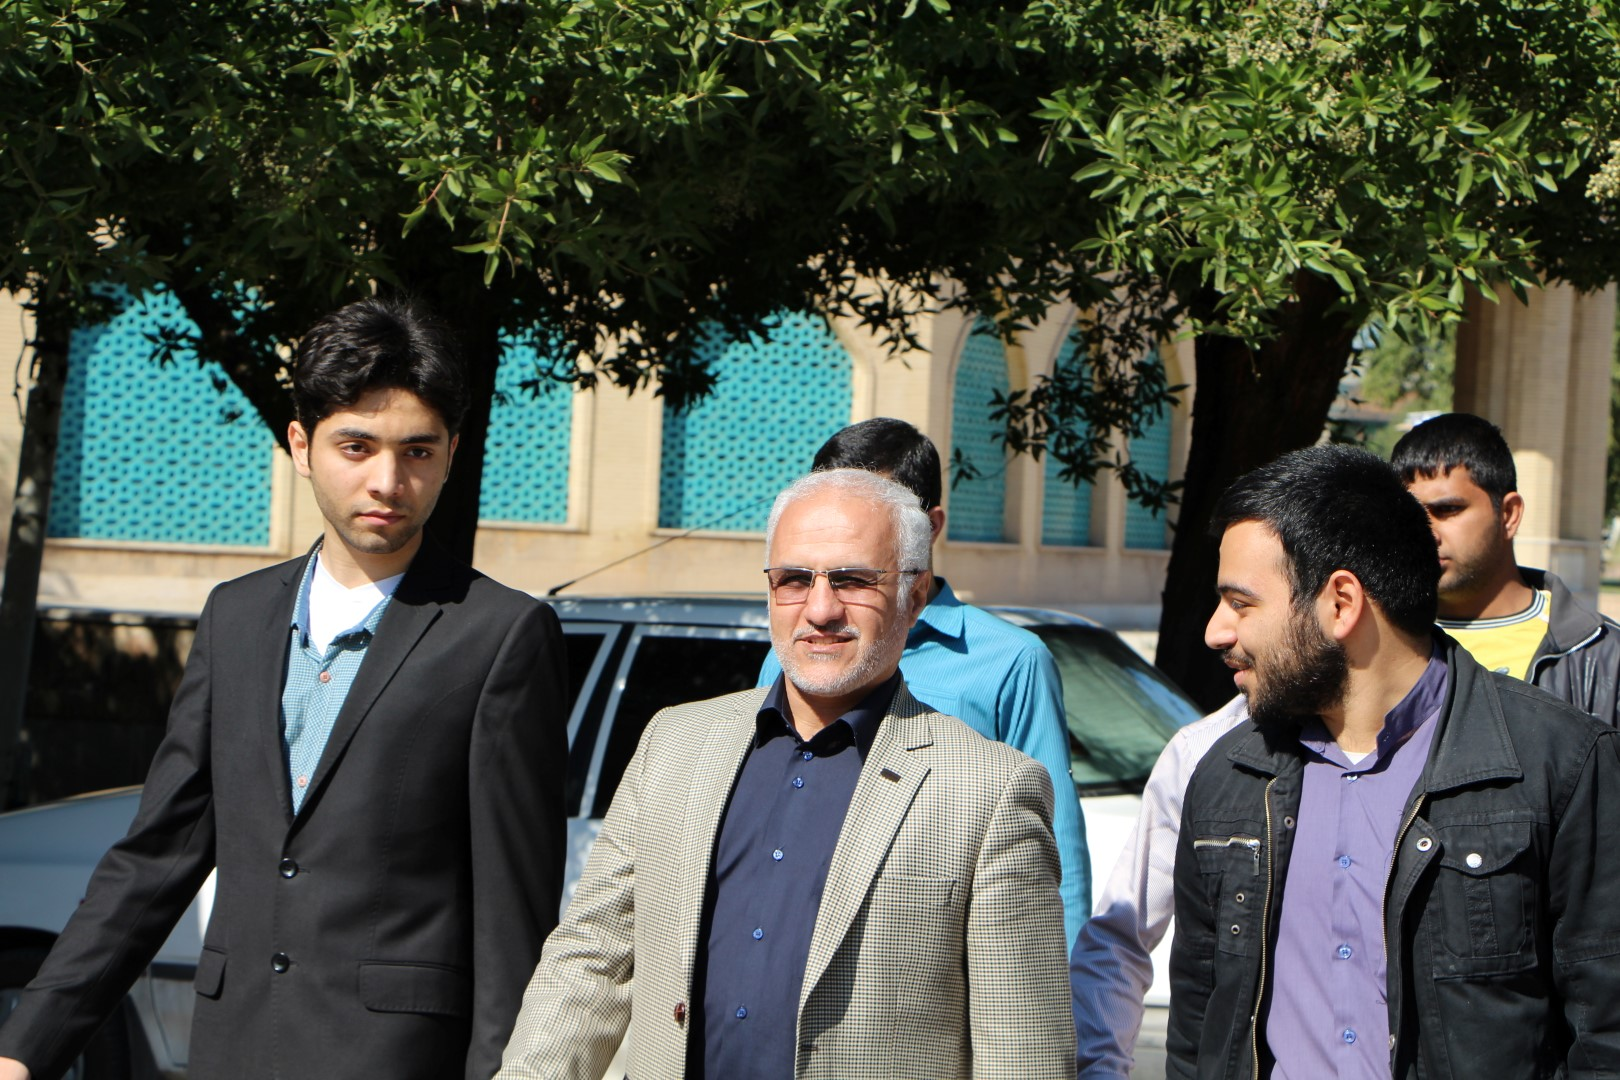 IMG 5113 گزارش تصویری؛ سخنرانی استاد حسن عباسی با موضوع از چوئن لای تا سیاست درهای باز